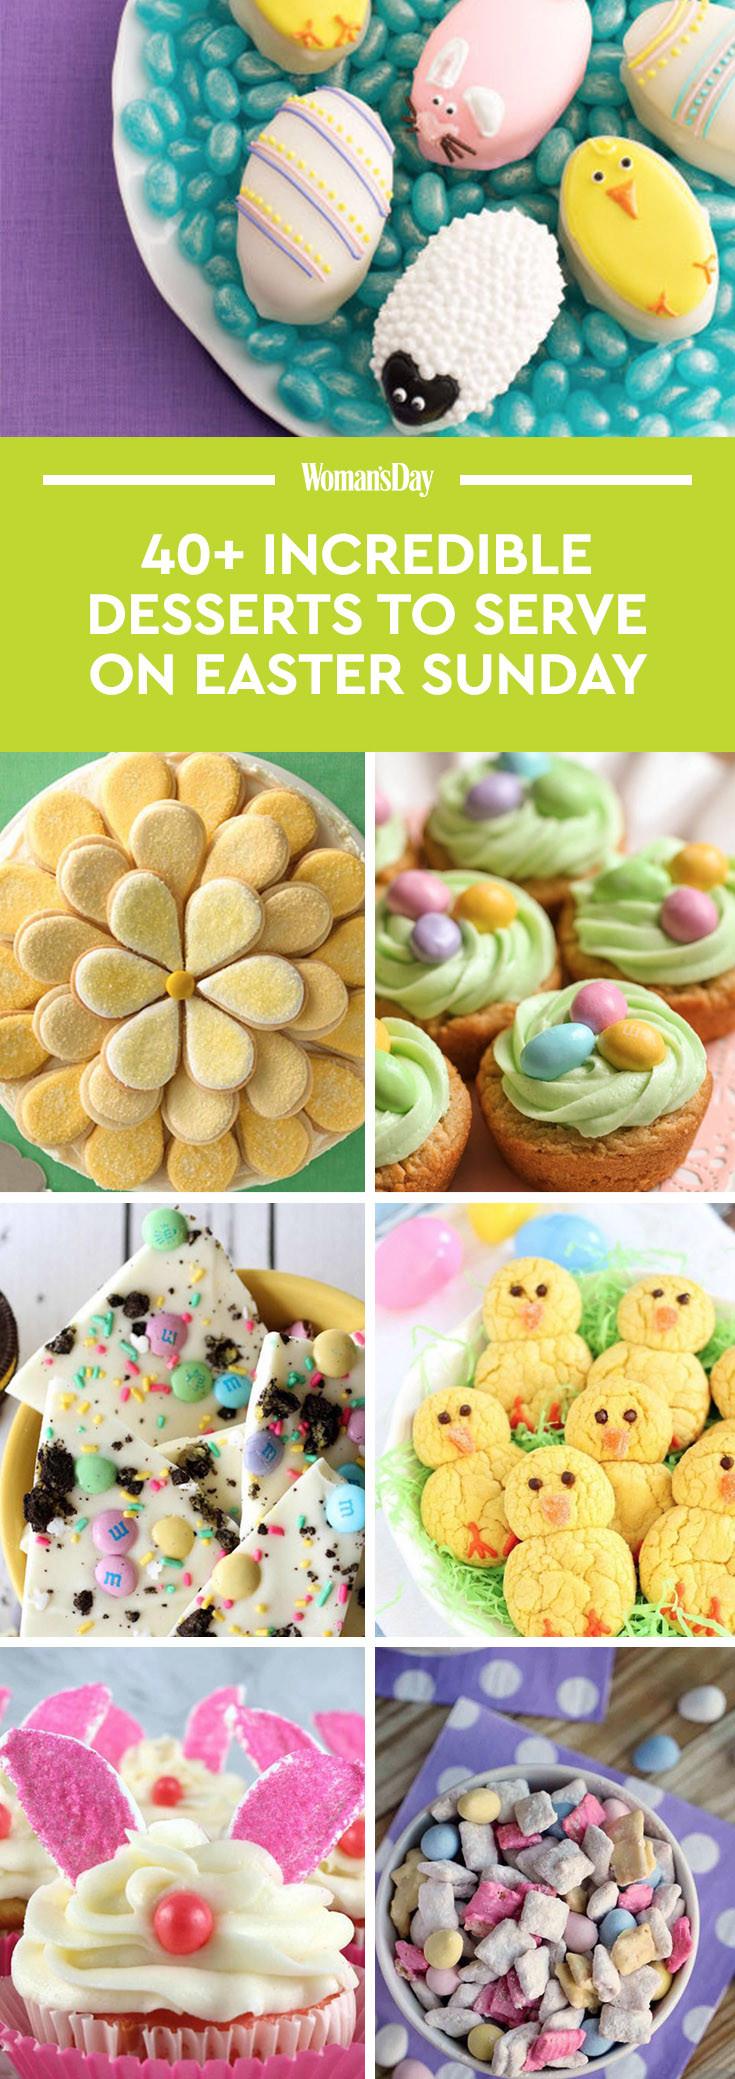 Favorite Easter Desserts  48 Best Easter Desserts Easy Ideas for Easter Dessert